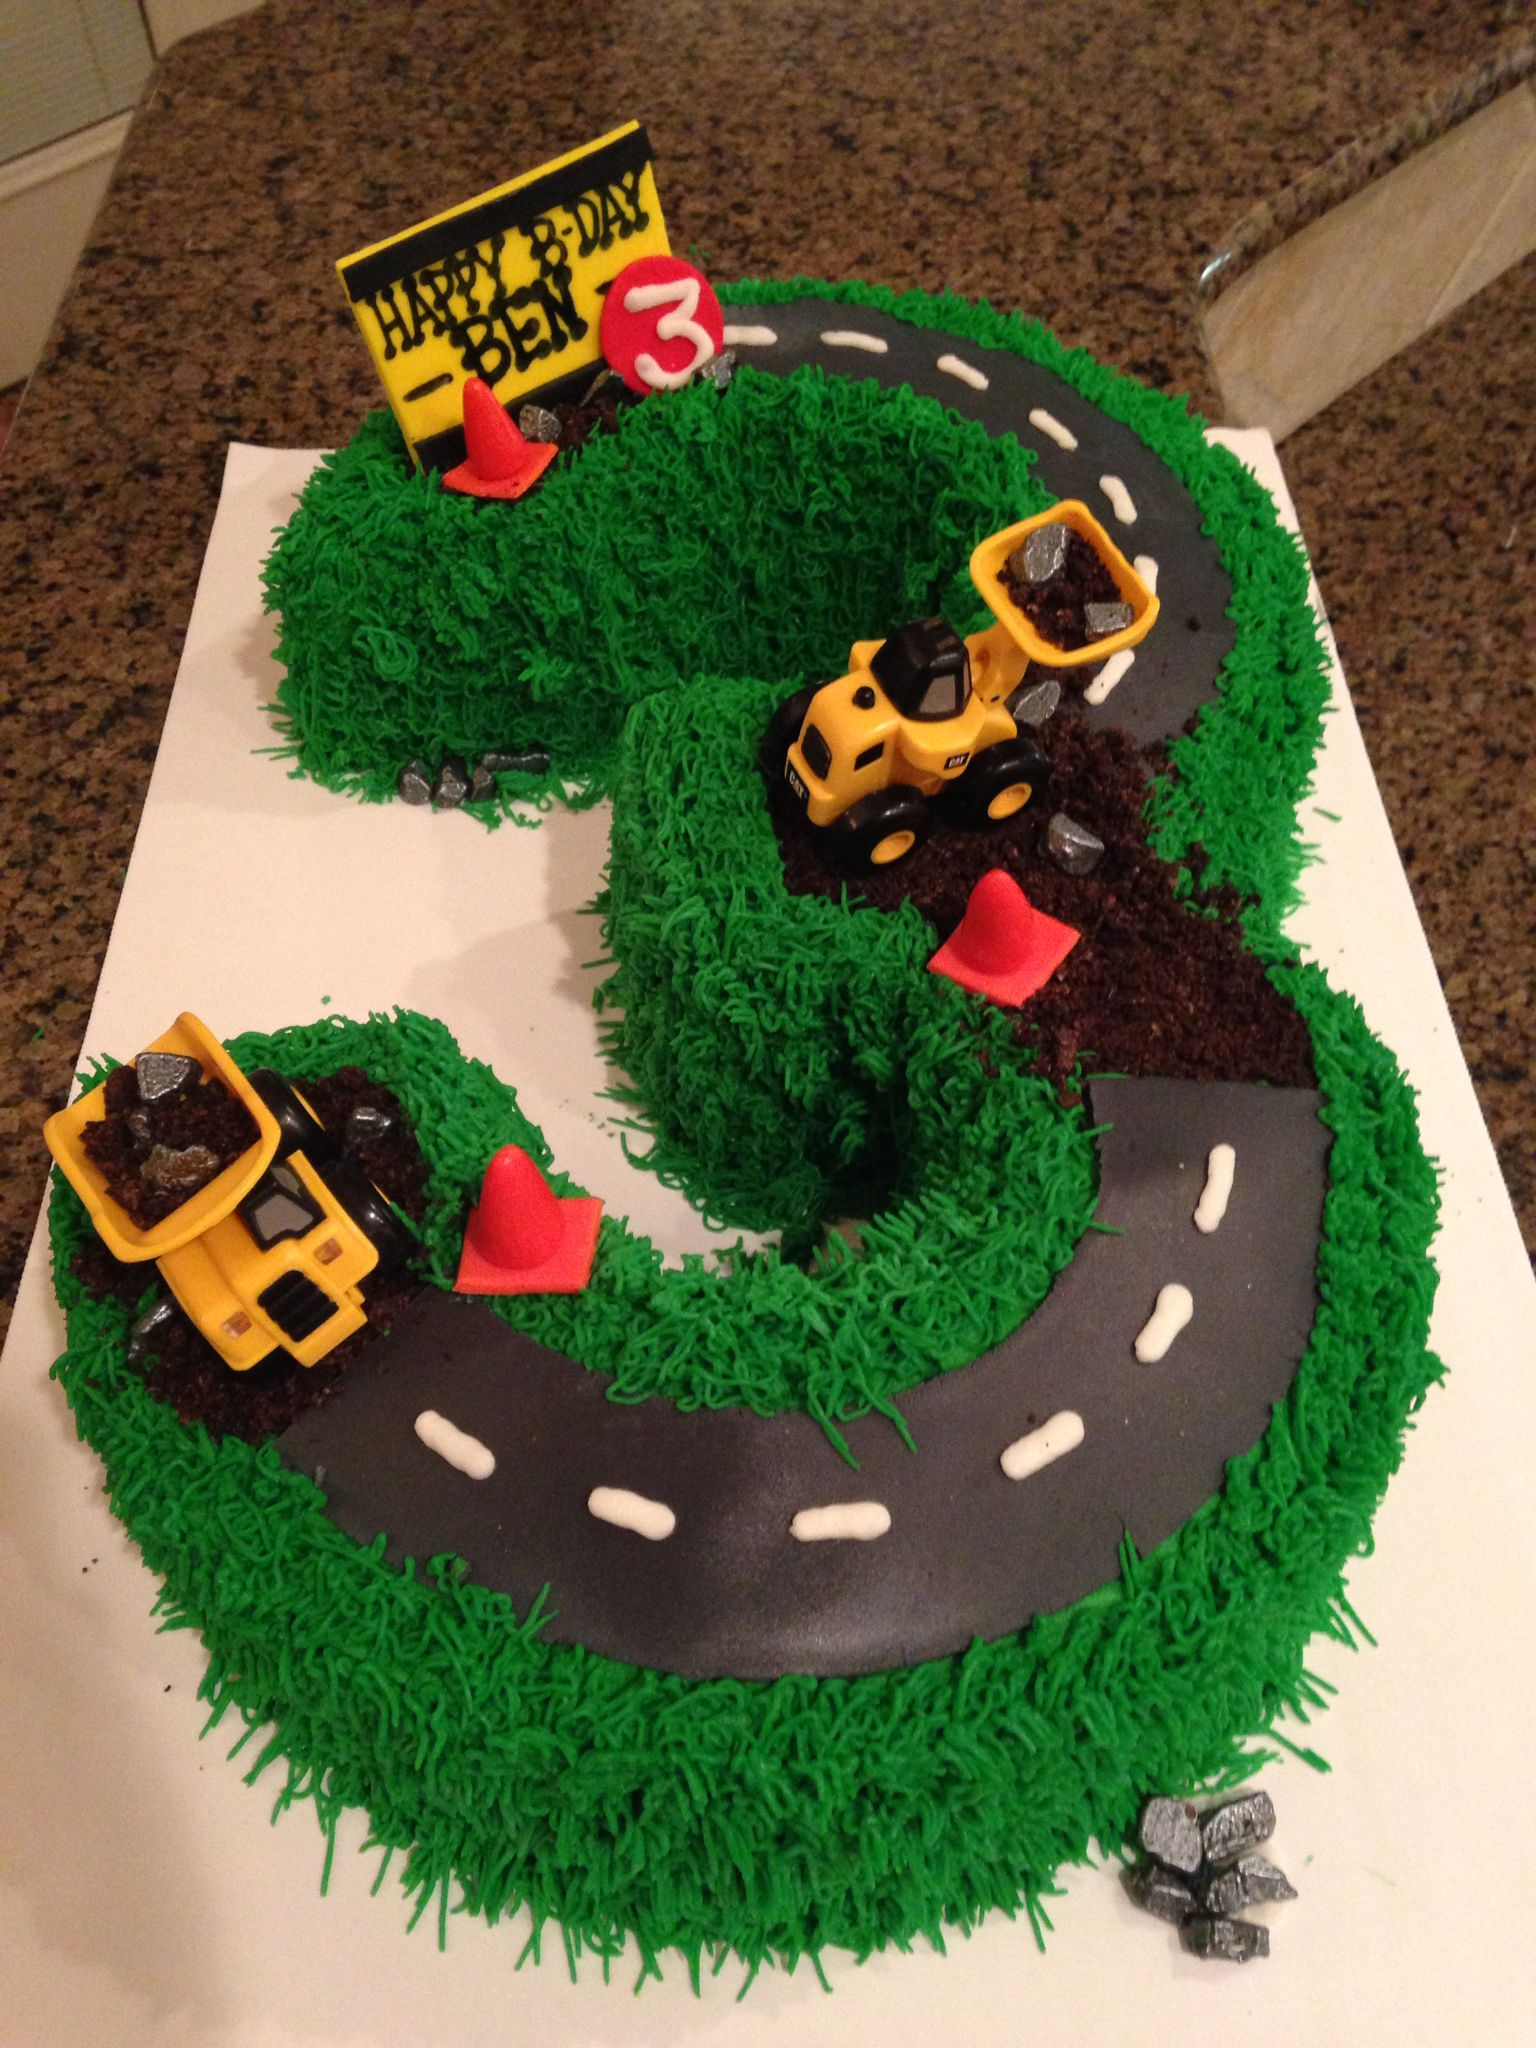 Phenomenal Construction Cake For 3Rd Birthday Buttercream With Fondant Funny Birthday Cards Online Alyptdamsfinfo